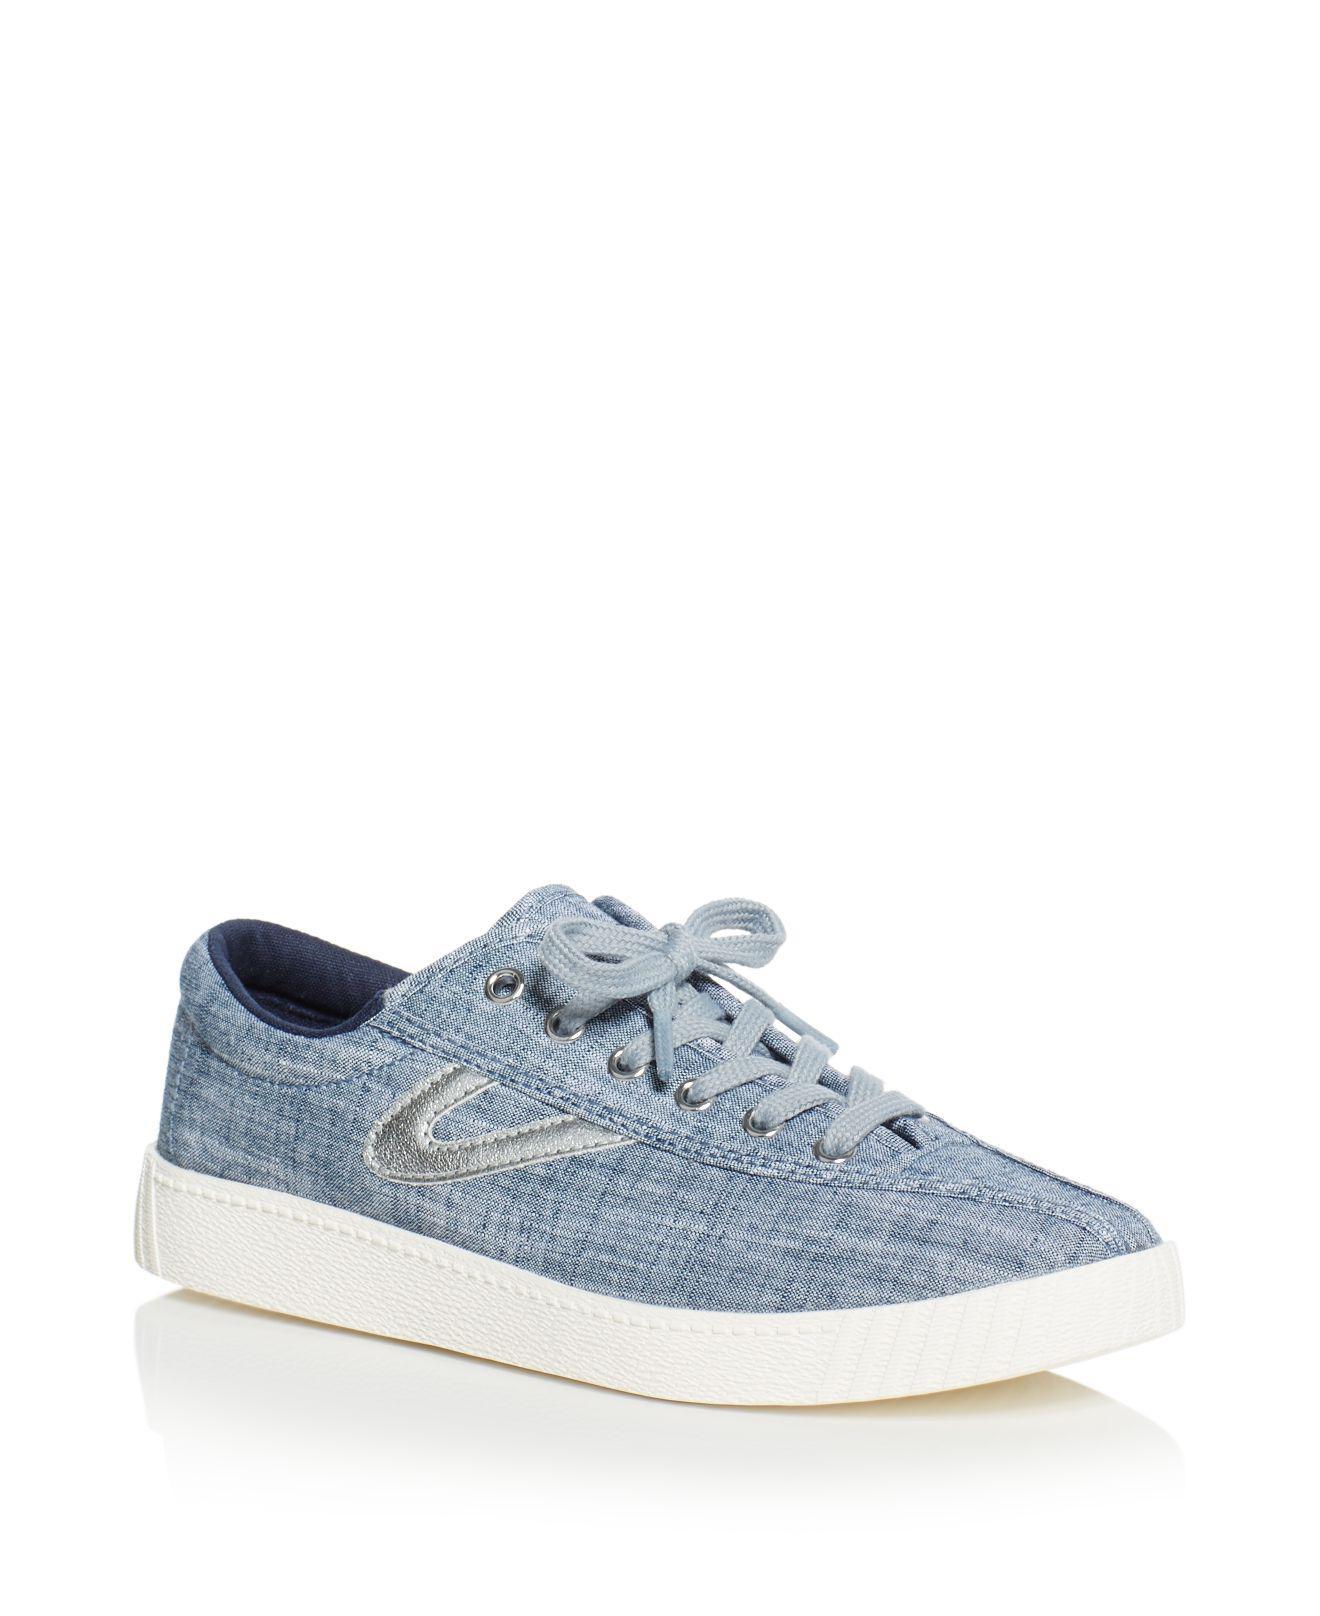 Cheap Latest Browse Cheap Online Tretorn NylitePlus Sneaker(Women's) -Vintage White/Green Denim Sale Release Dates Discount Wholesale Price Cheapest Price Cheap Online j7MIjh